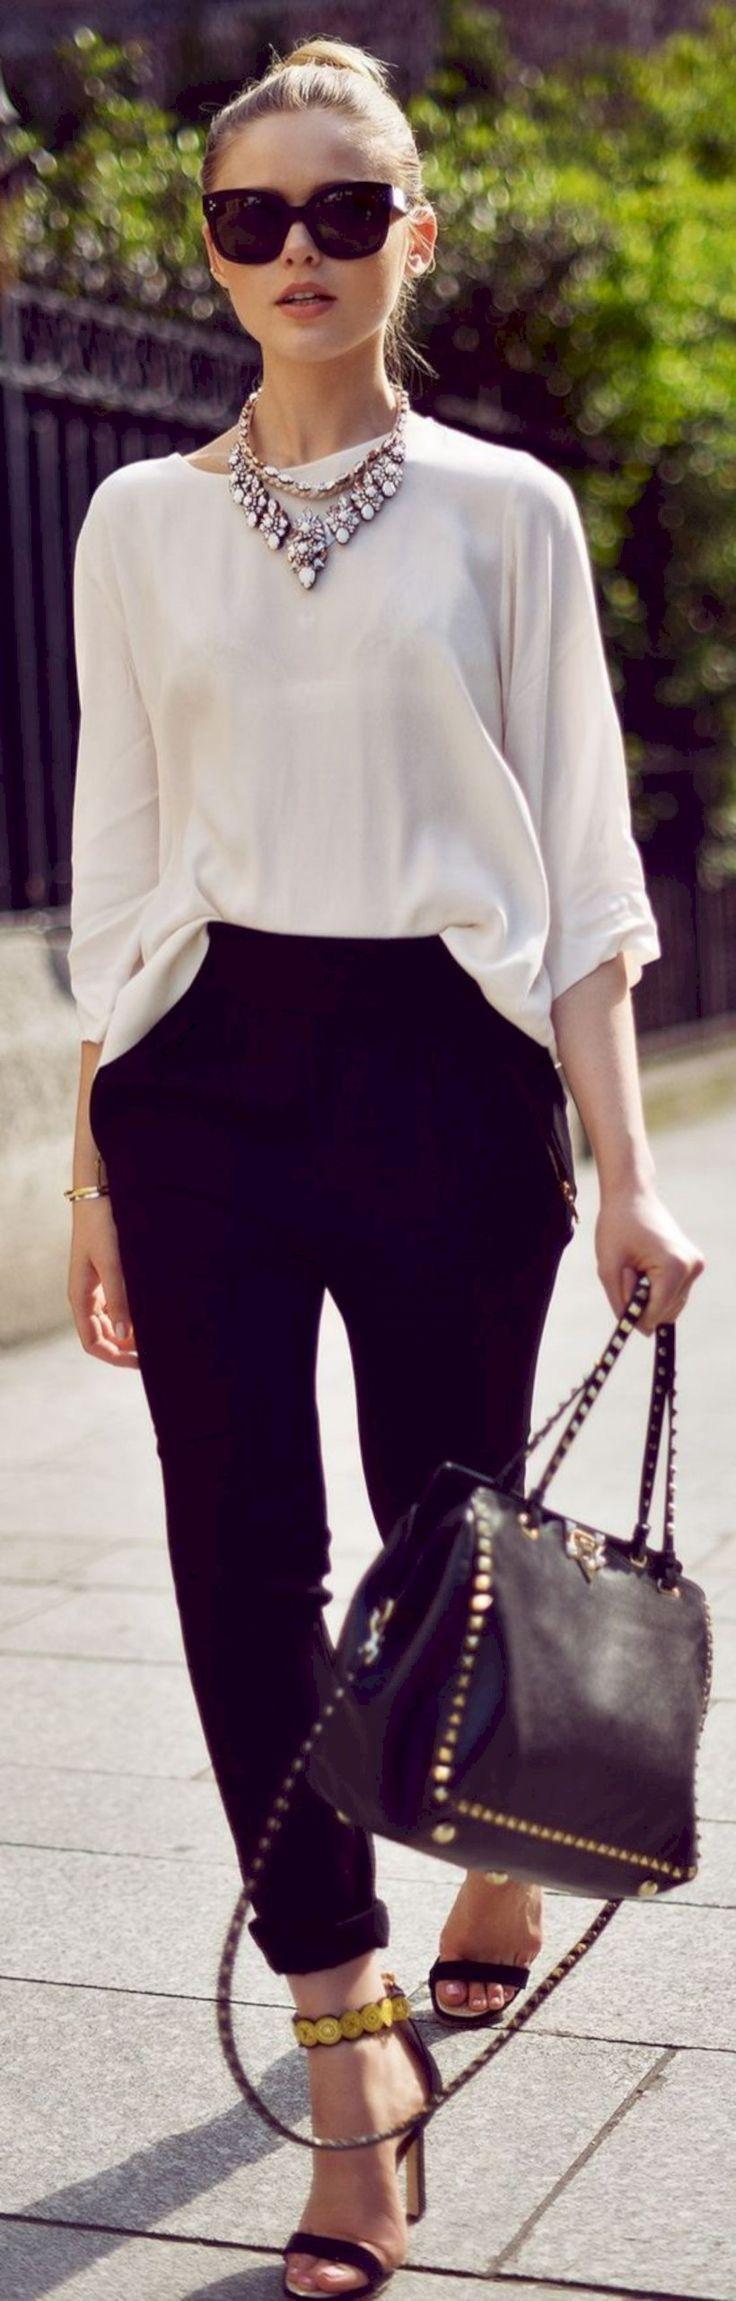 best 25+ trendy business attire ideas on pinterest | women's